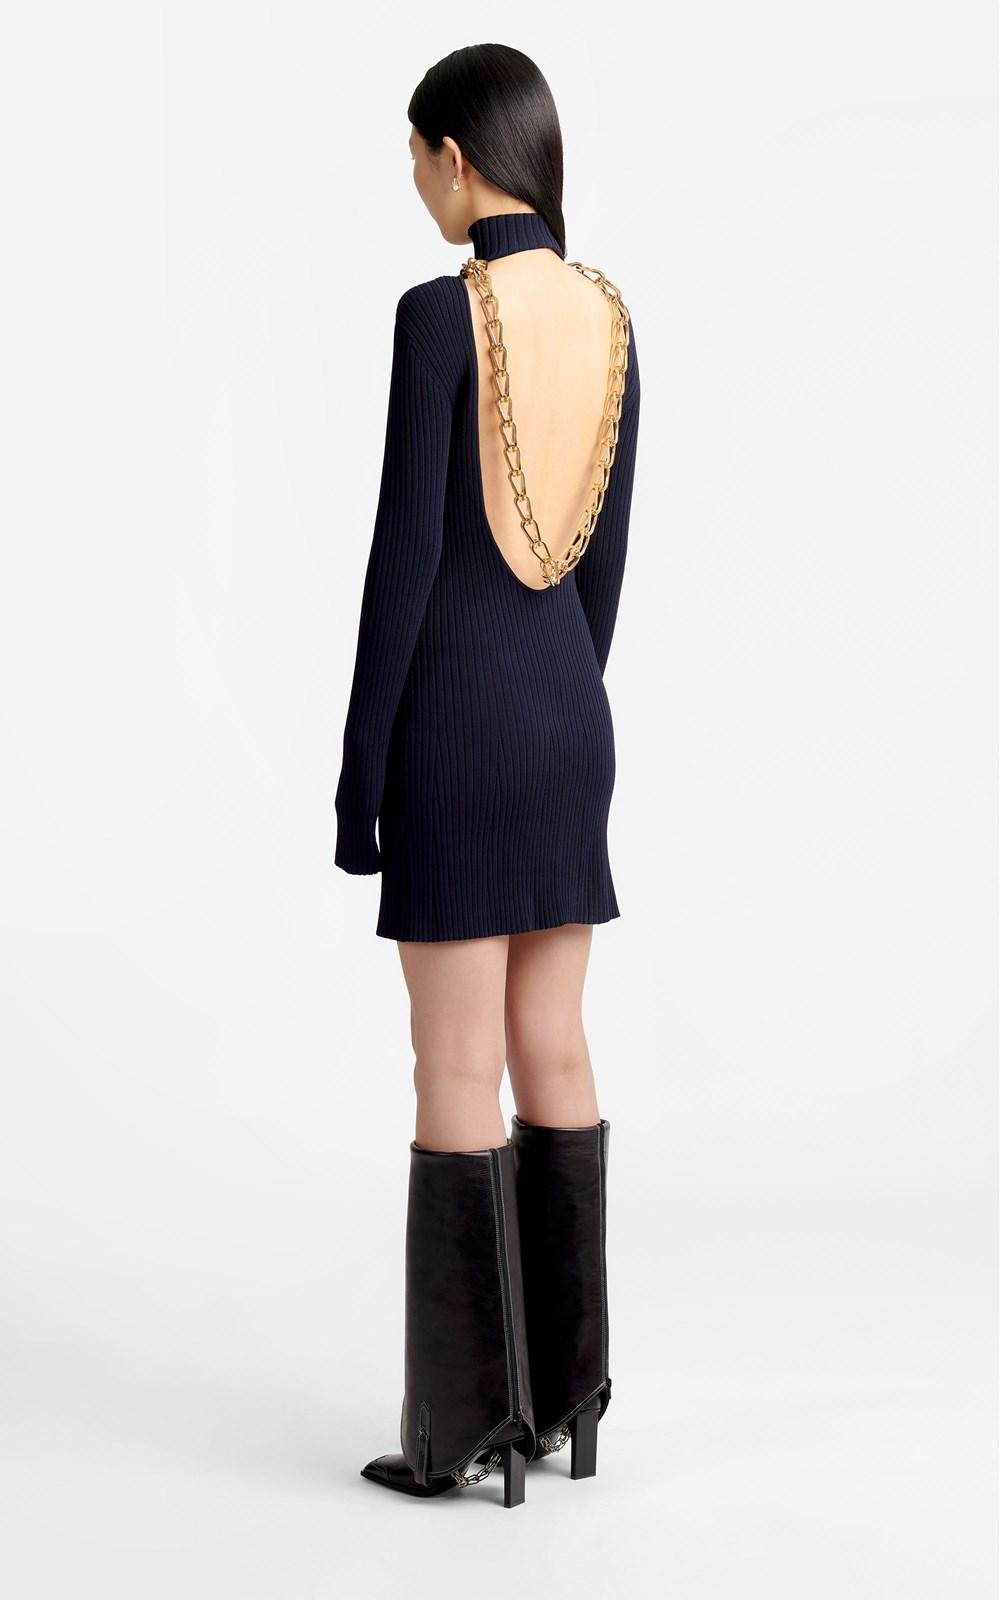 New  | LUSTRATE CHAIN MINI DRESS